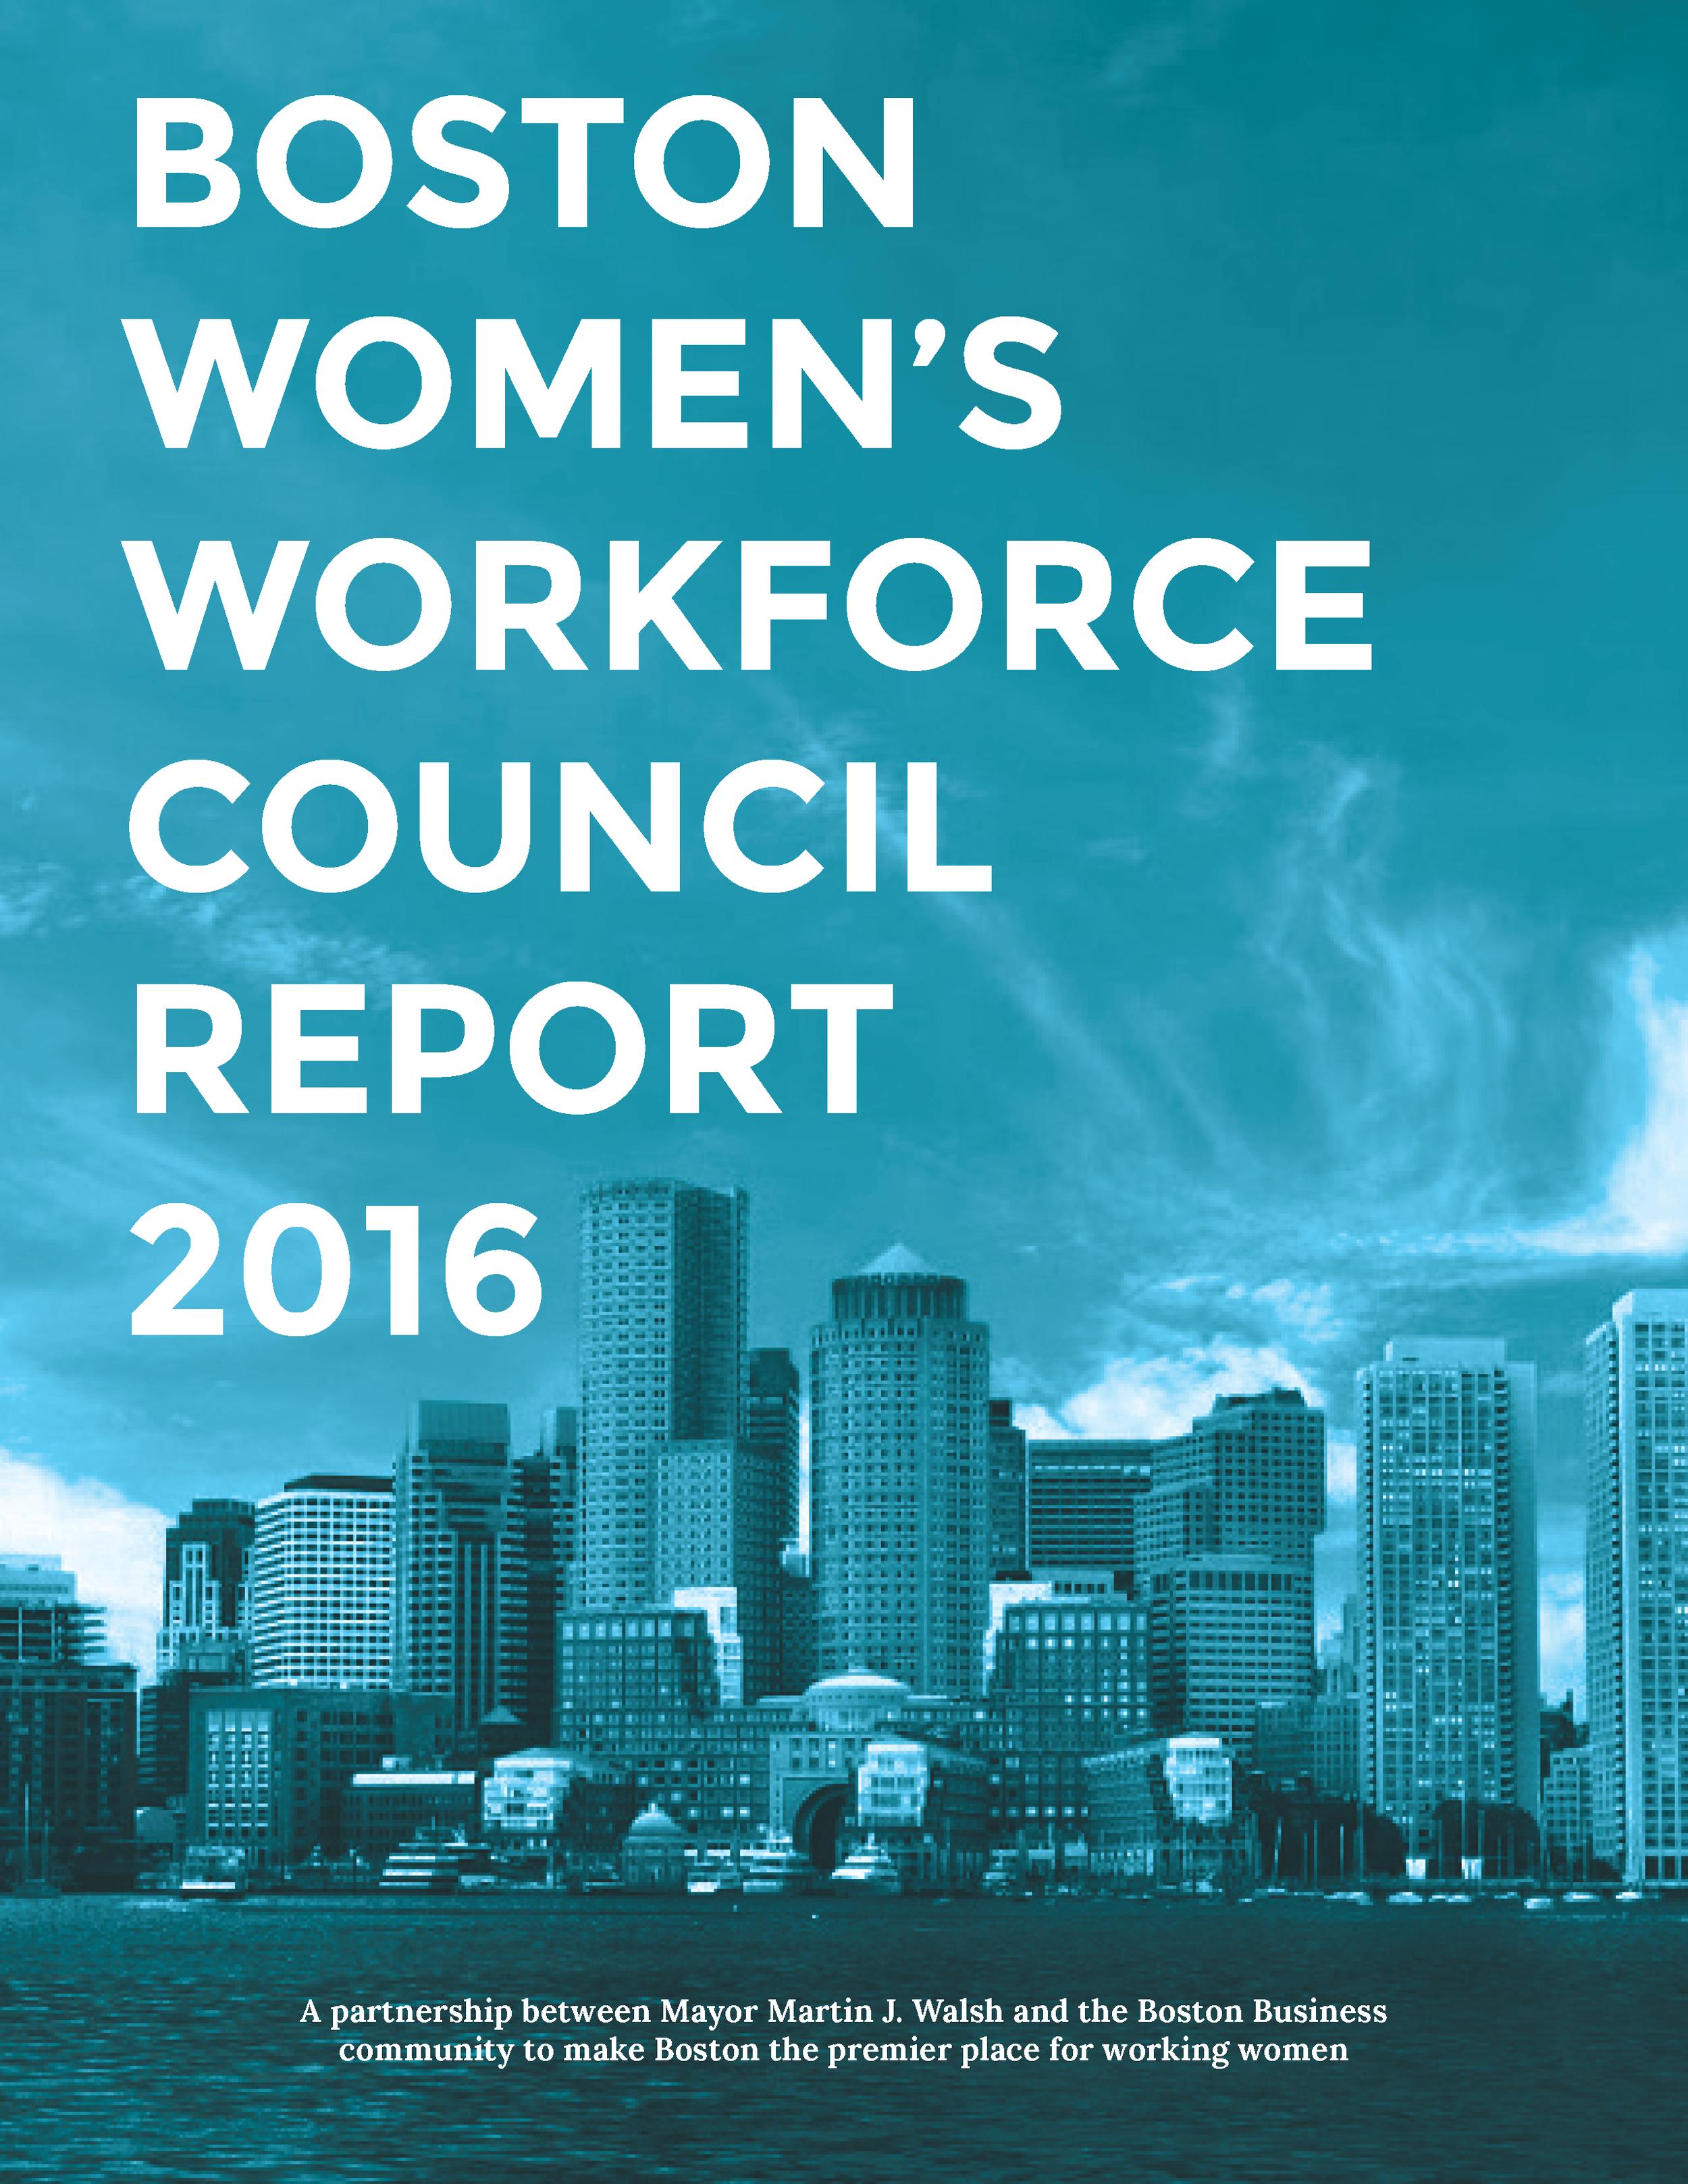 BostonWomen'sWorkforceCouncilReport2016_Page_01.png